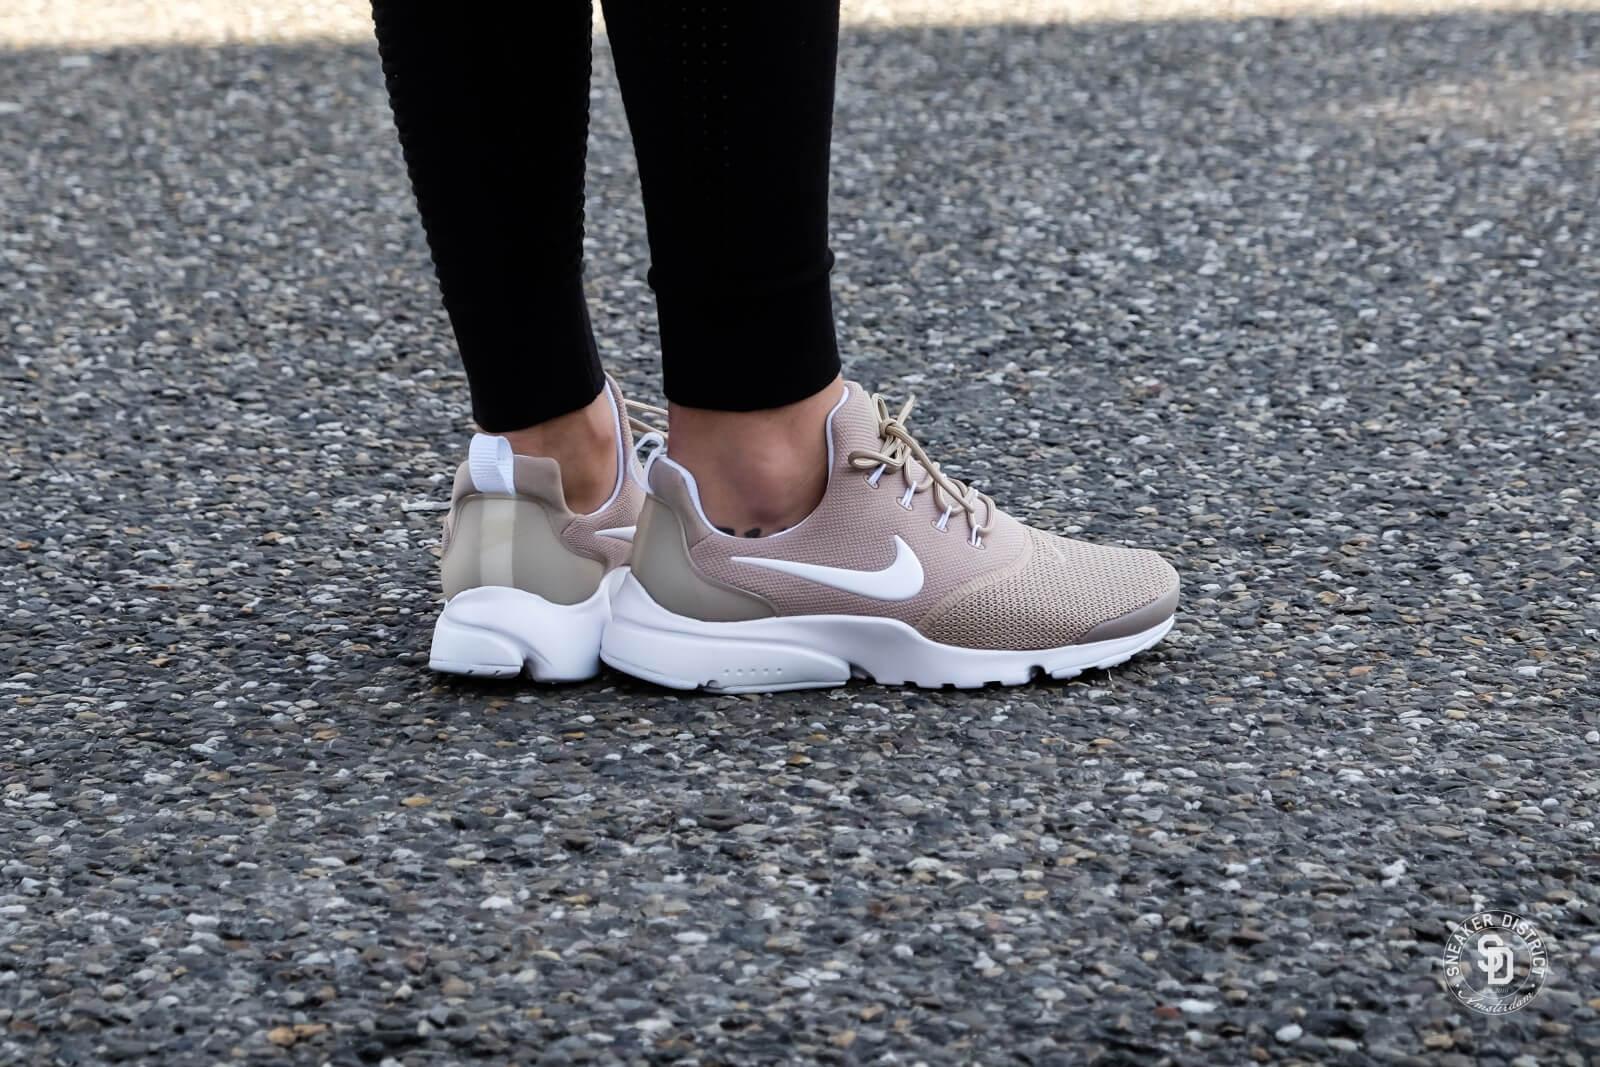 Nike Wmns Presto Fly Sand/ White HX5KFvuoej